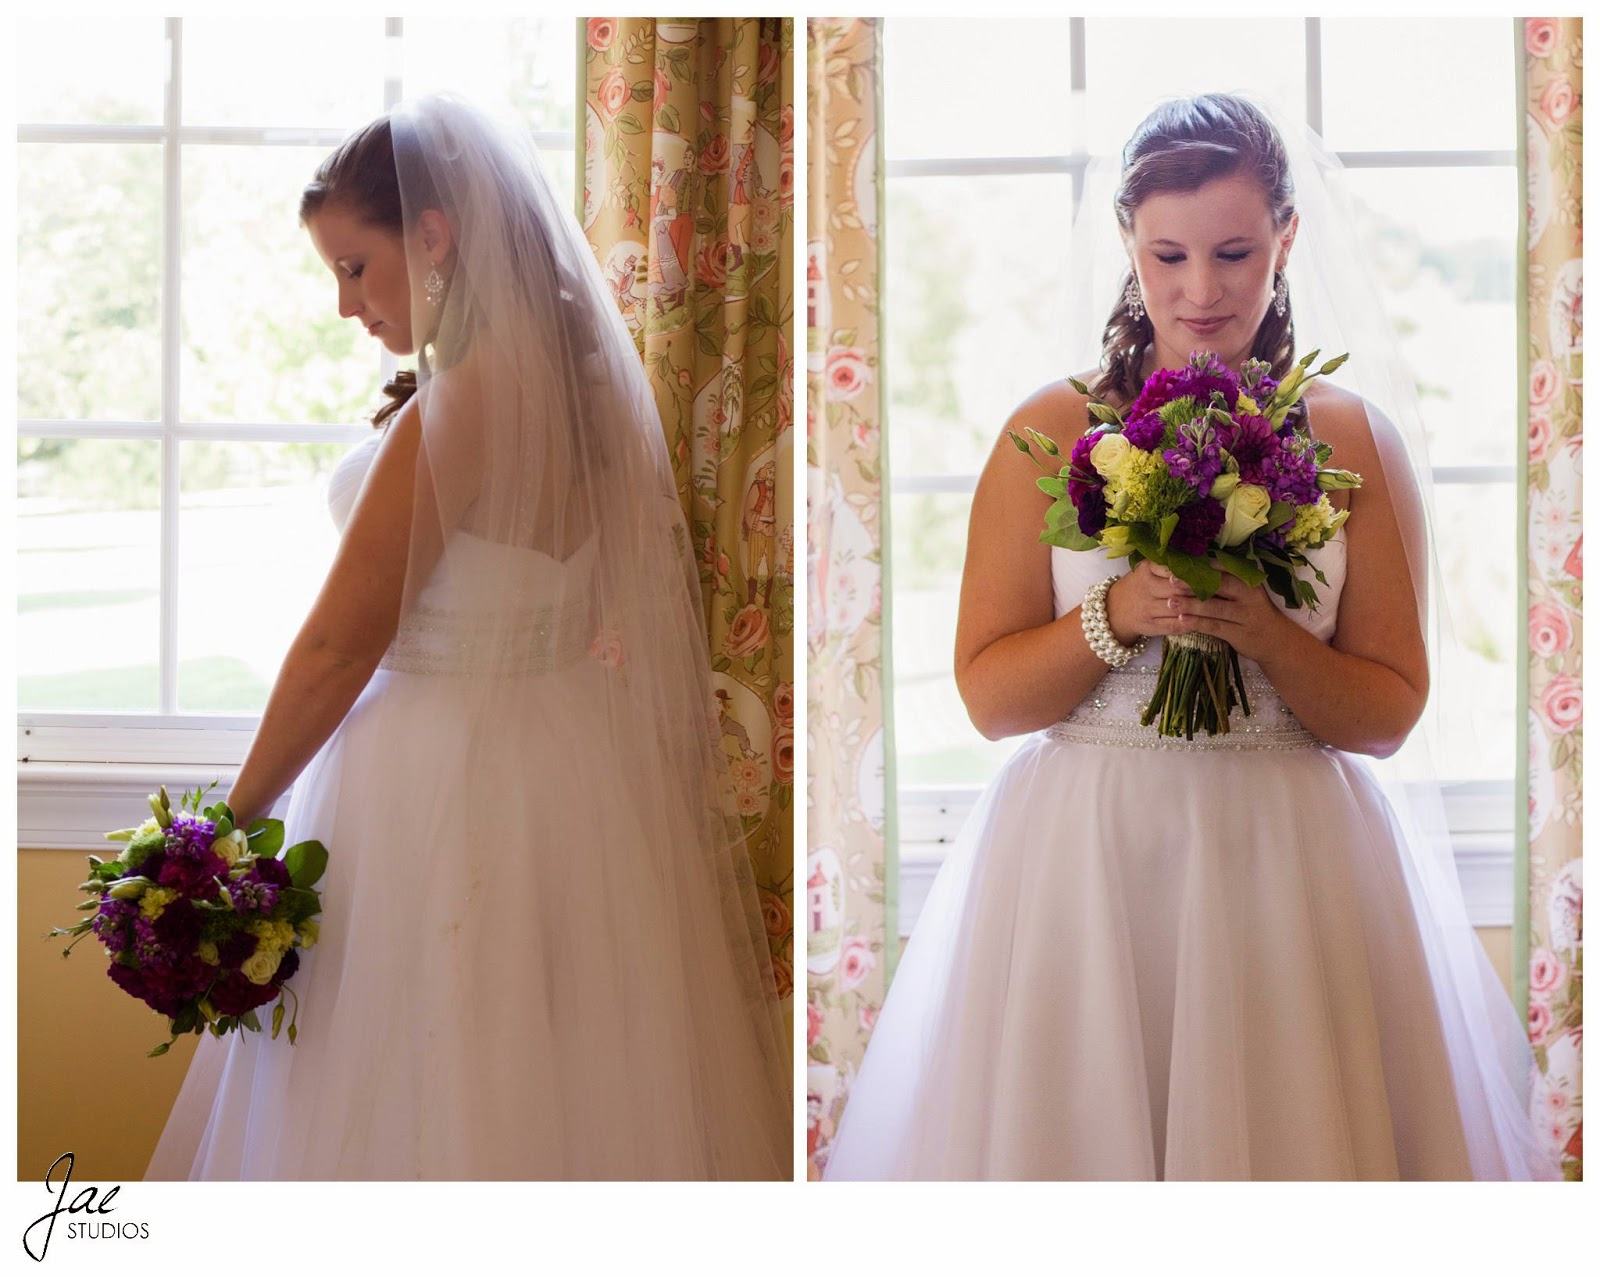 Jonathan and Julie, Bird cage, West Manor Estate, Wedding, Lynchburg, Virginia, Jae Studios. bride, flowers, posing, wedding dress, veil, bouquet, window